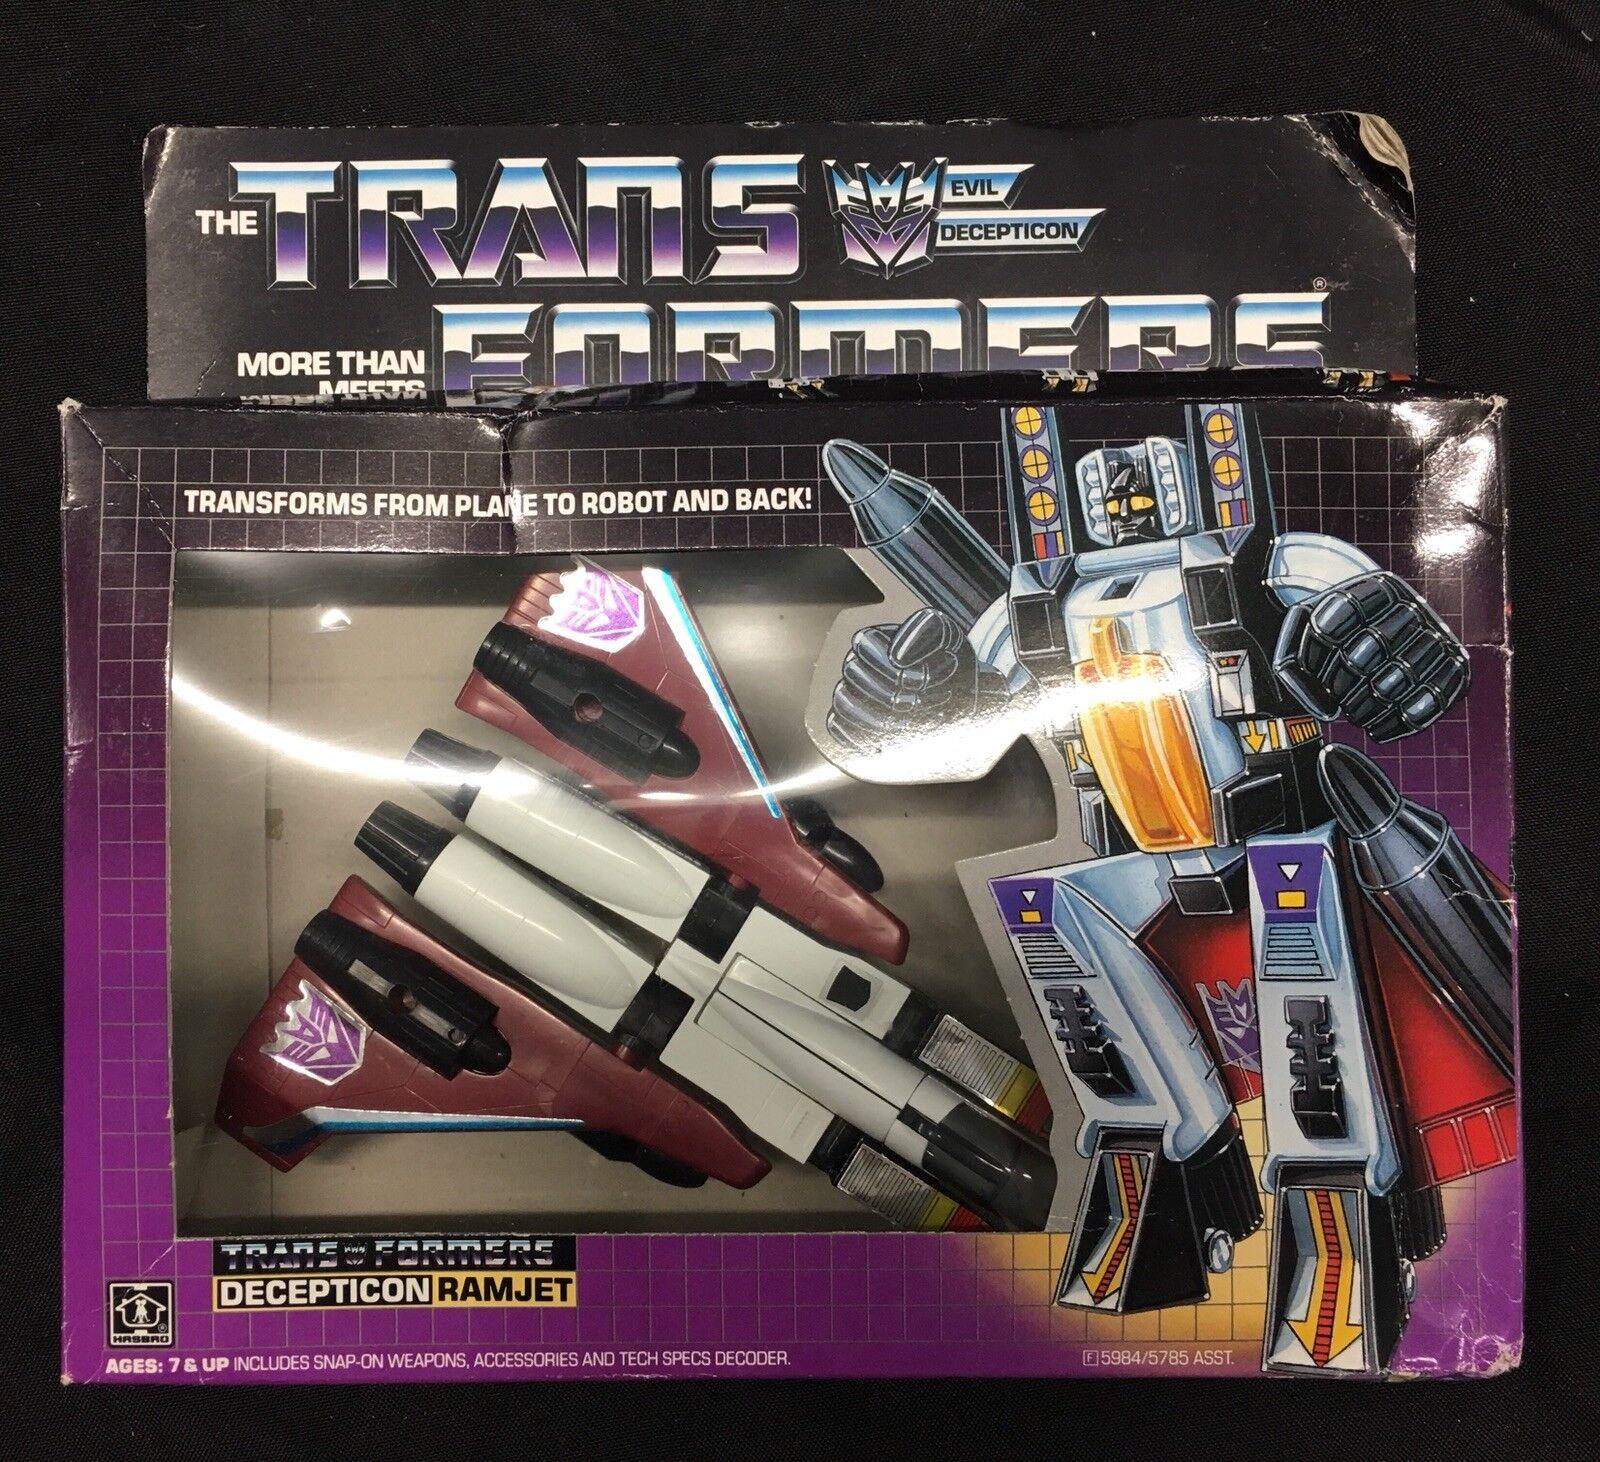 Hasbro Transformers - Decepticon Ramjet - 1985 G1